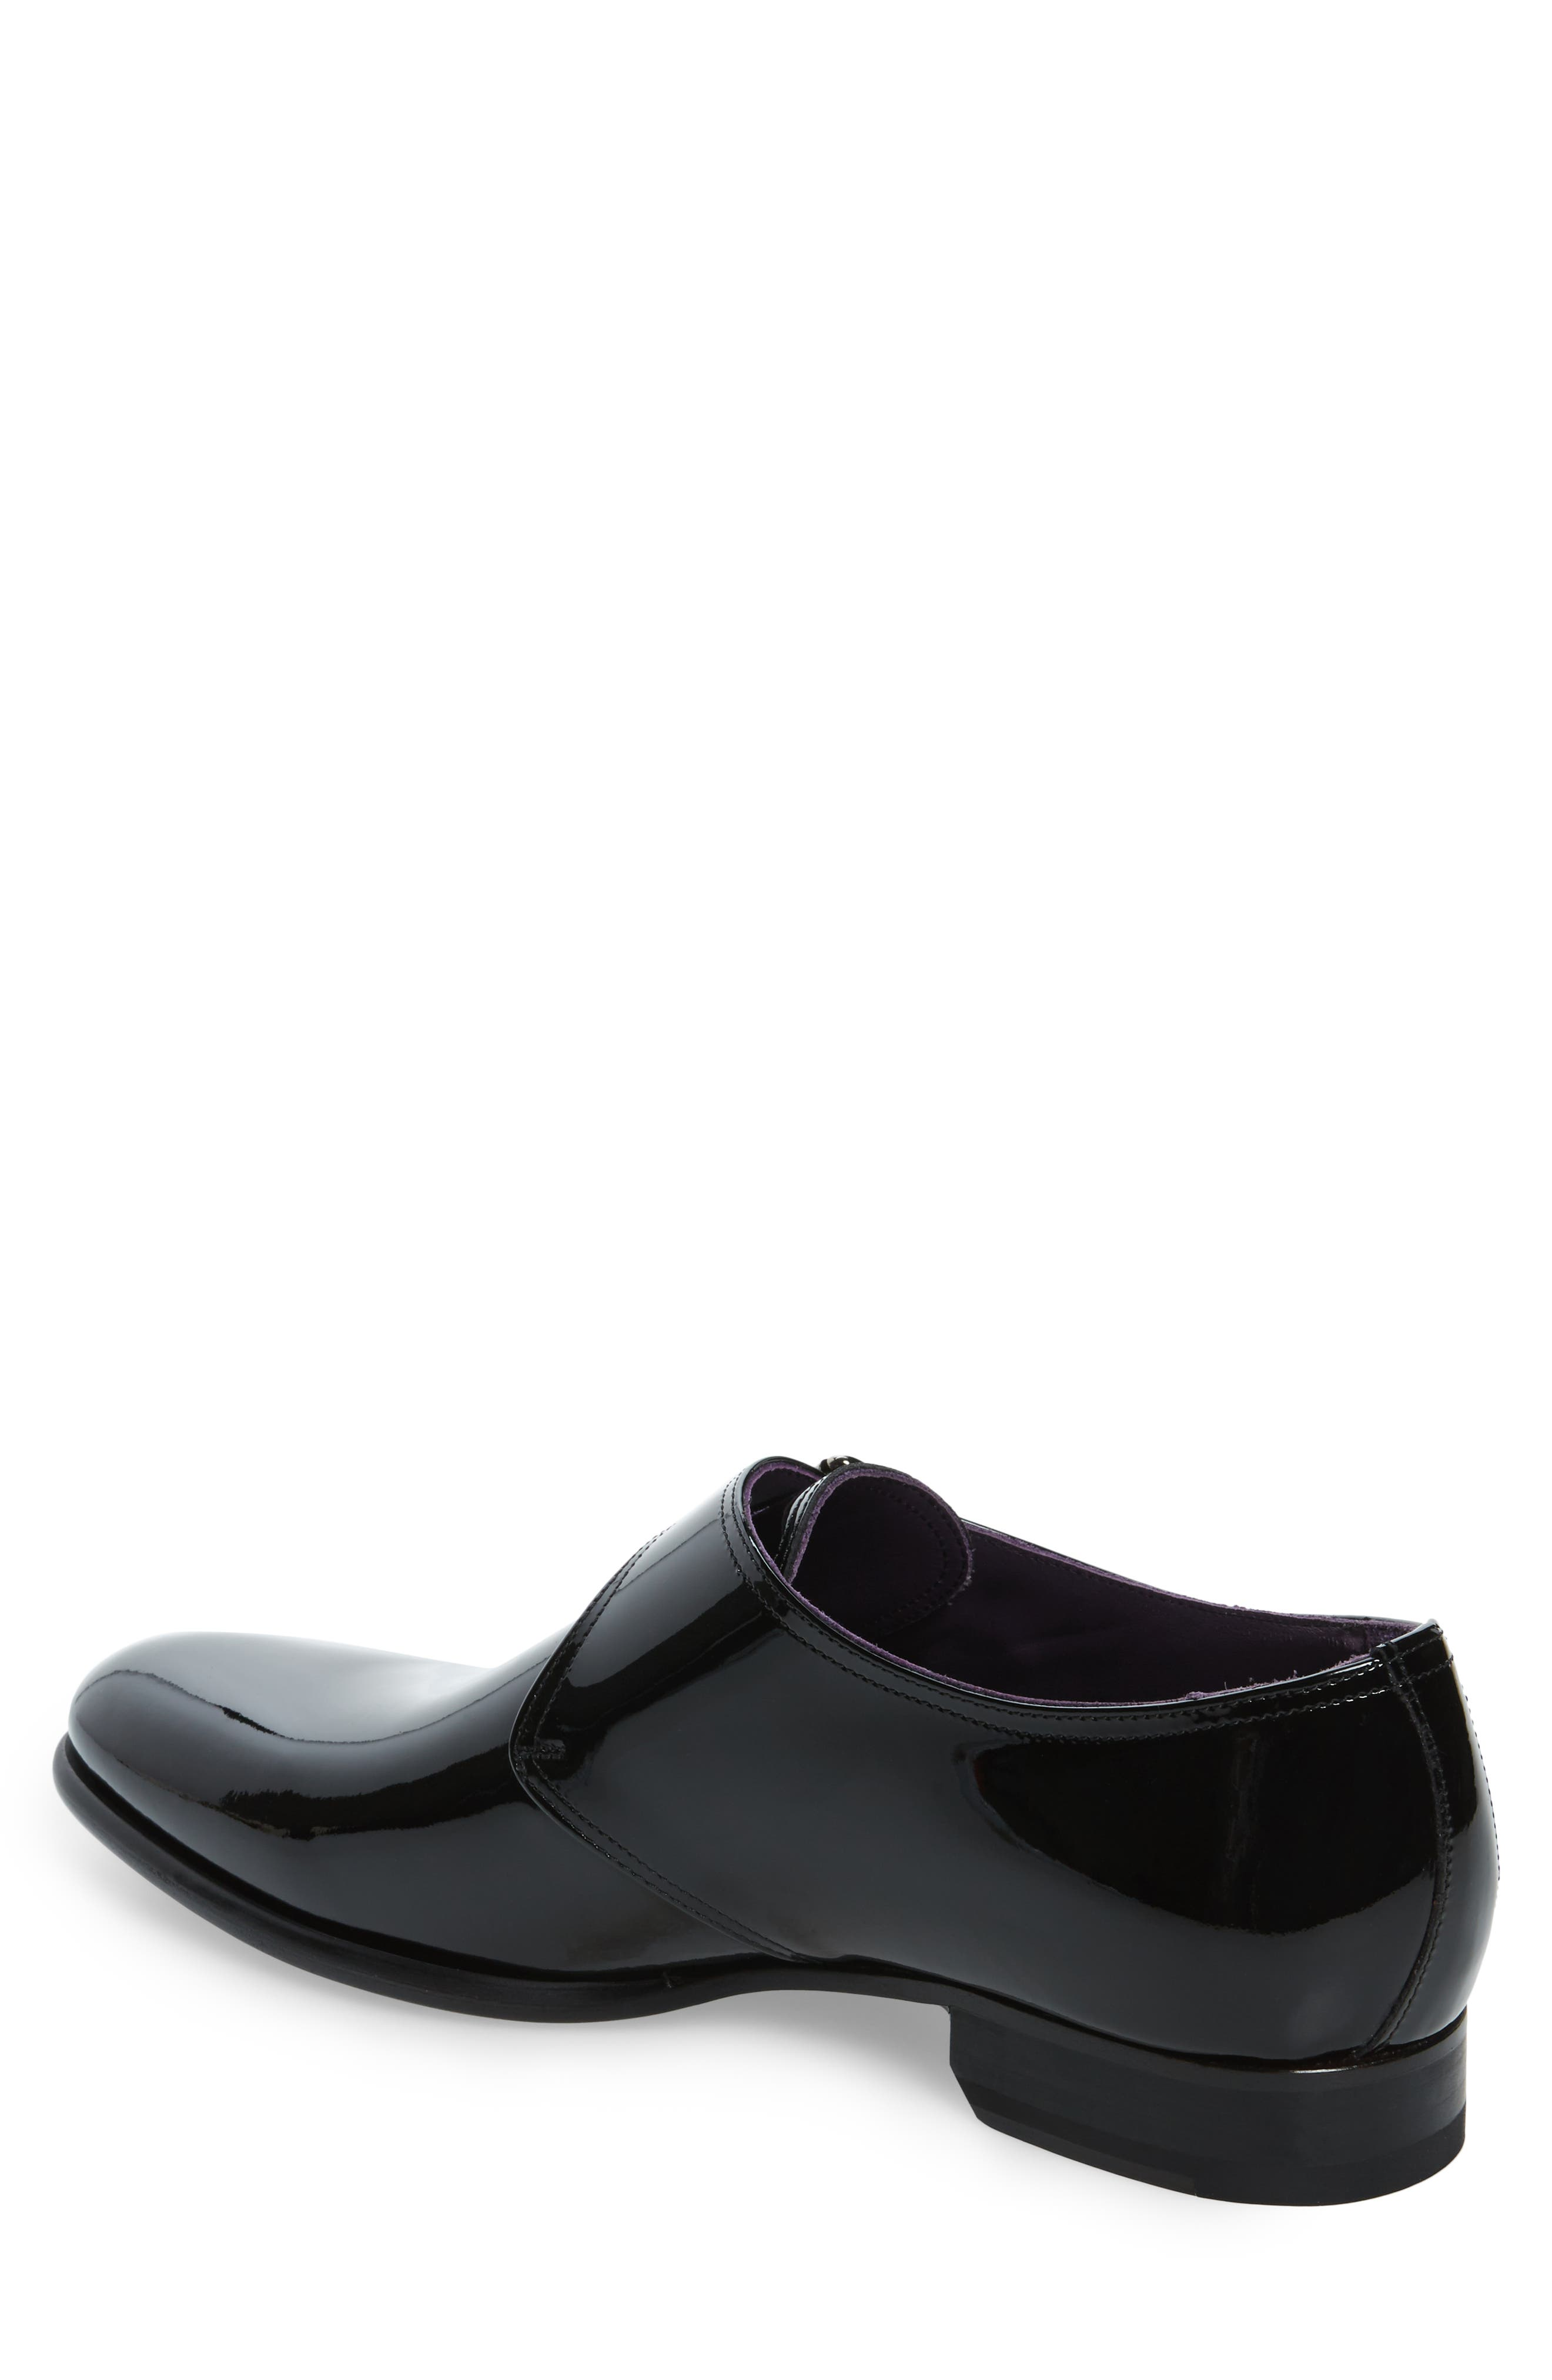 Emmett Monk Strap Shoe,                             Alternate thumbnail 7, color,